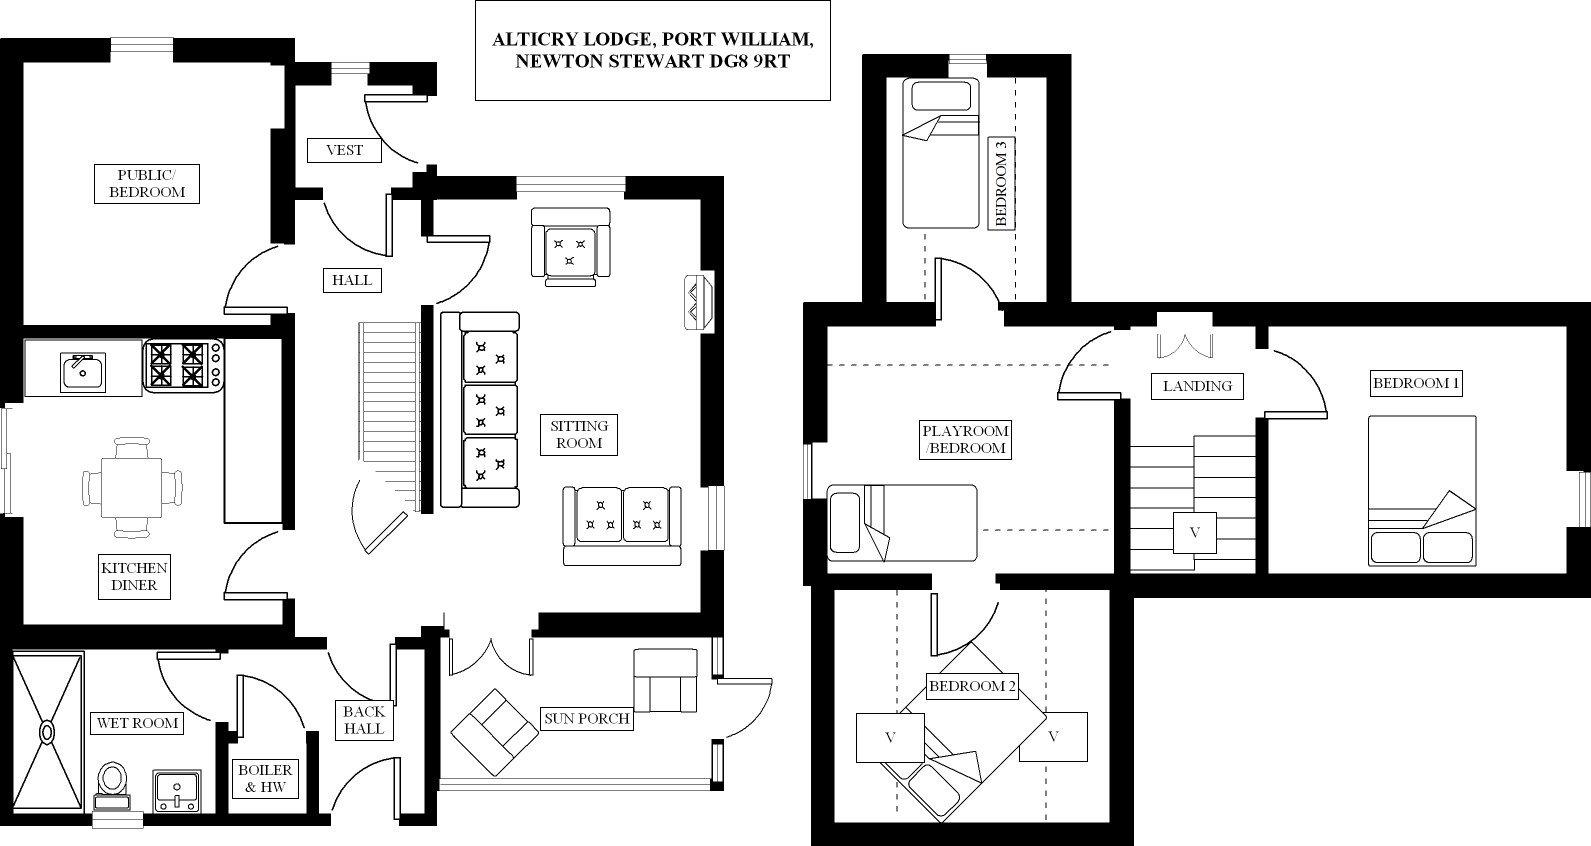 Alticry Lodge Floorplan